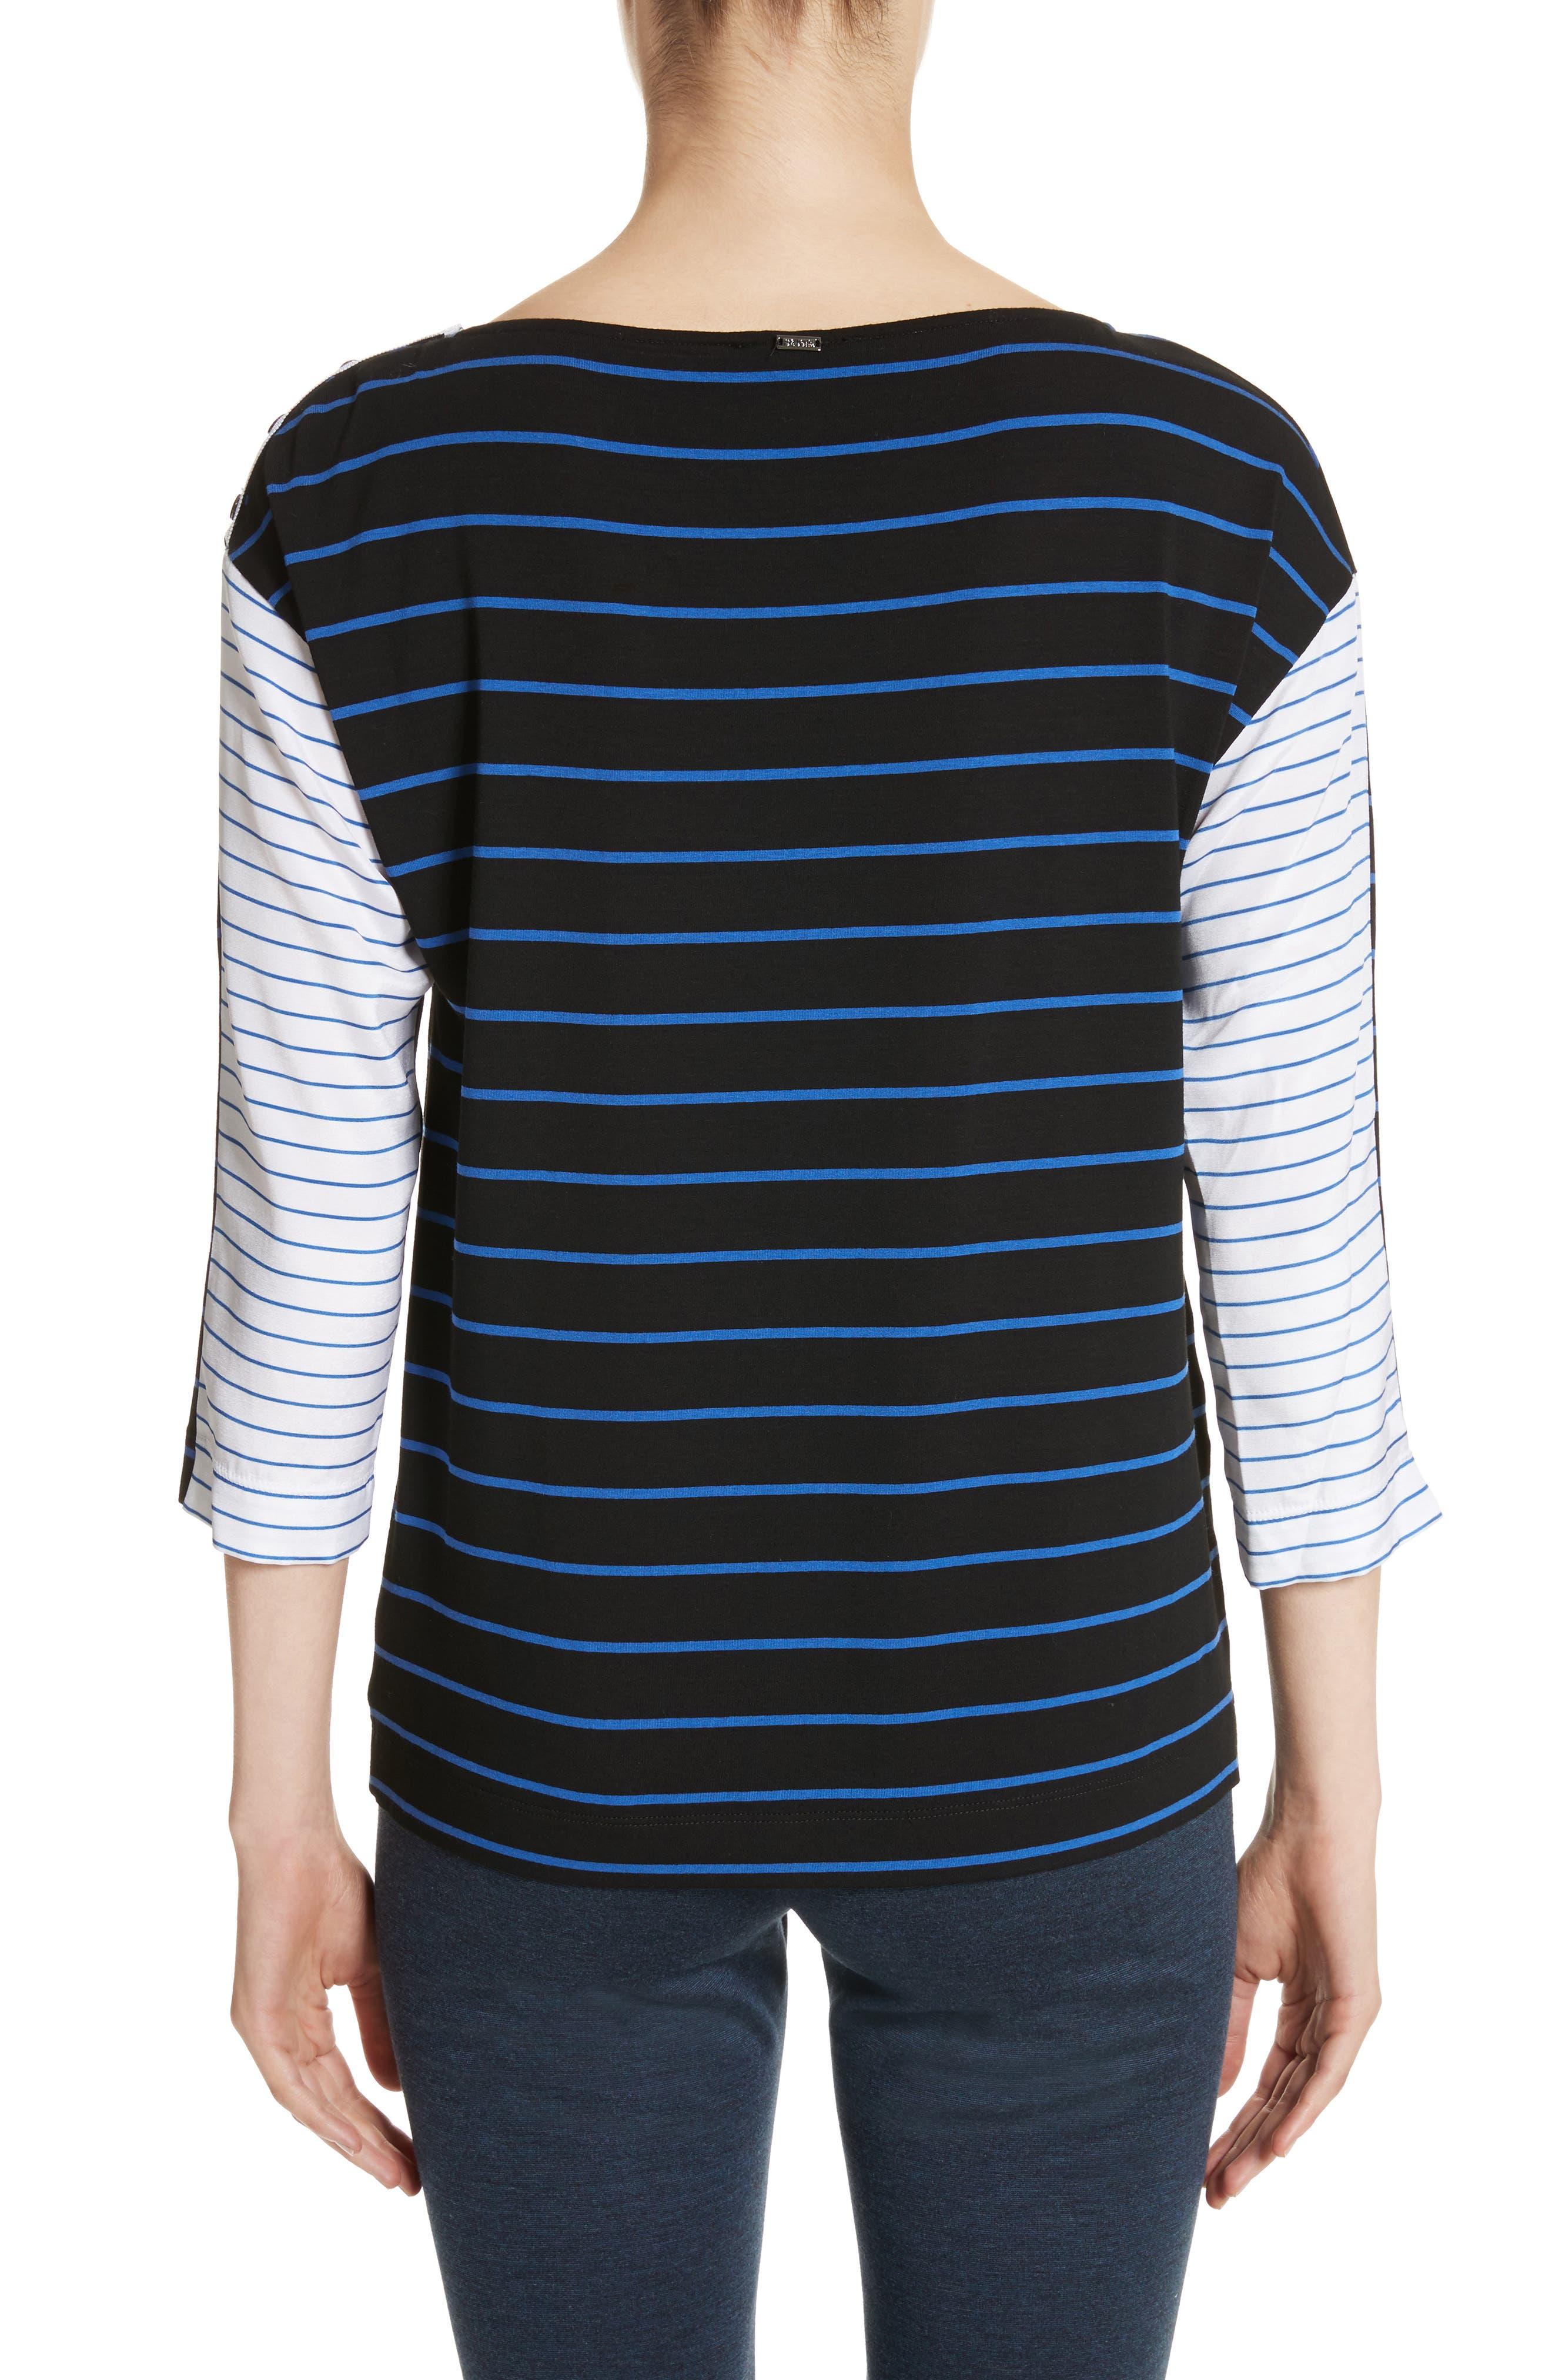 Yarn Dyed Stripe Jersey Top,                             Alternate thumbnail 2, color,                             Caviar/ Niagara/ Bianco